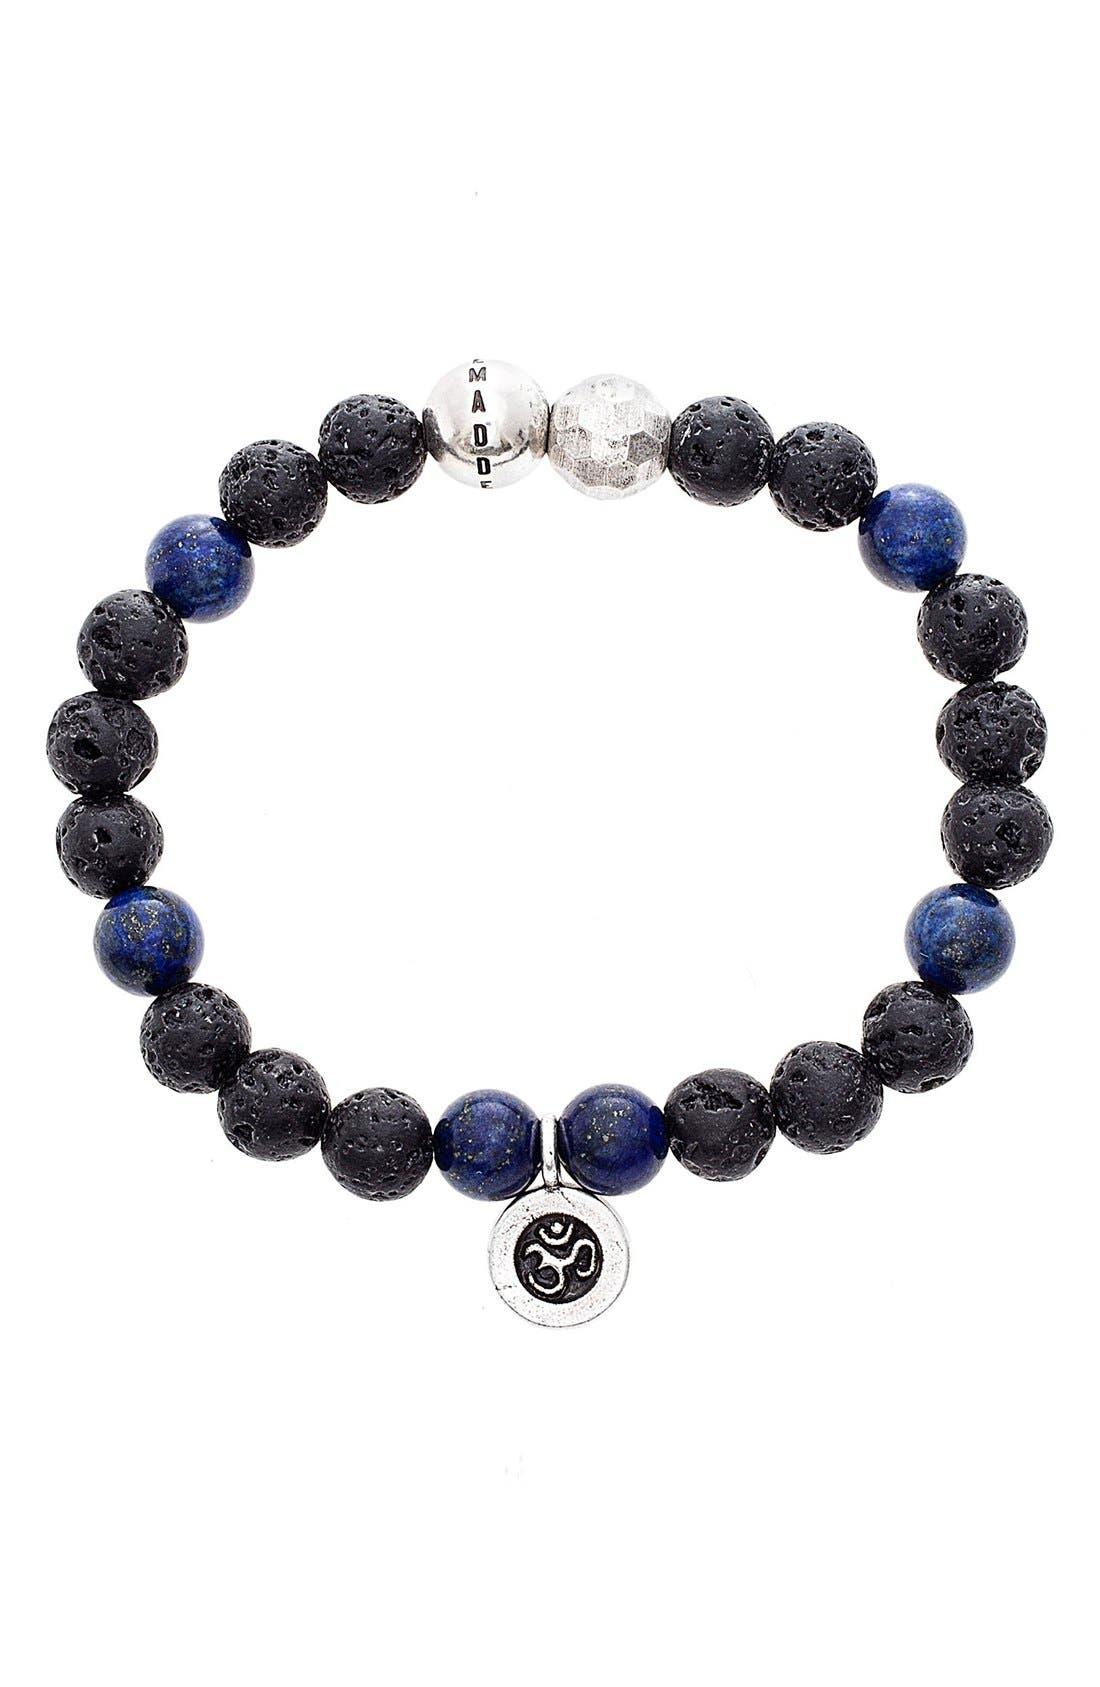 Lapis Lazuli & Lava Rock Bead Bracelet,                         Main,                         color, BLACK/ BLUE